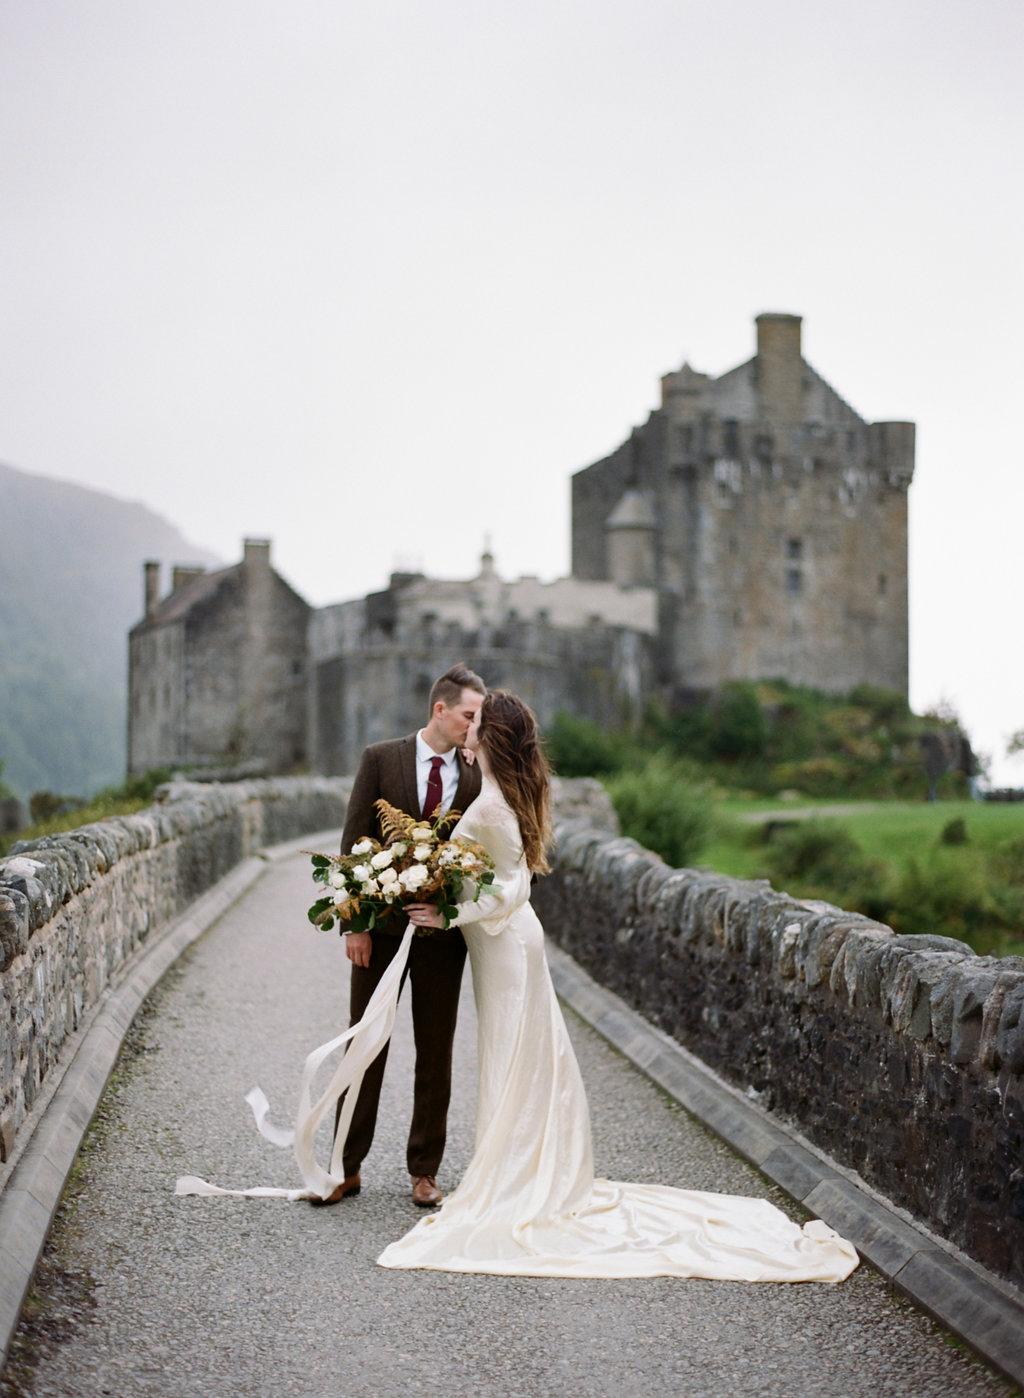 Scotland-Prewedding-highlands-castle-Engagment-Photos-Katie-Grant (5 of 139).jpg